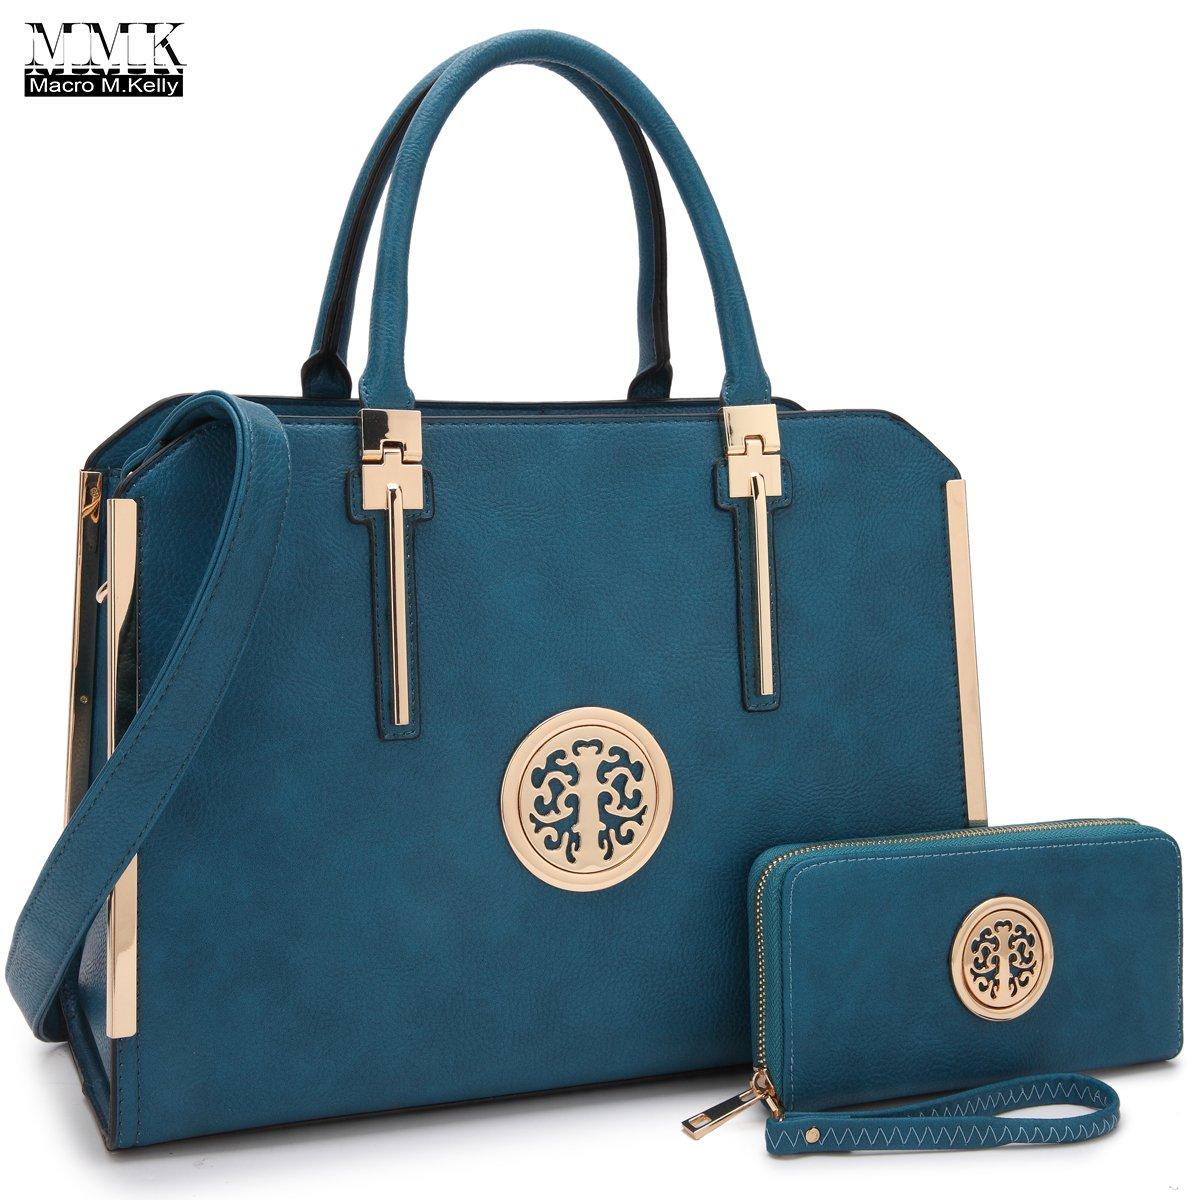 Women's Designer Handbags Tote Bag Satchel handbag Shoulder Bags Tote Purse(BL)